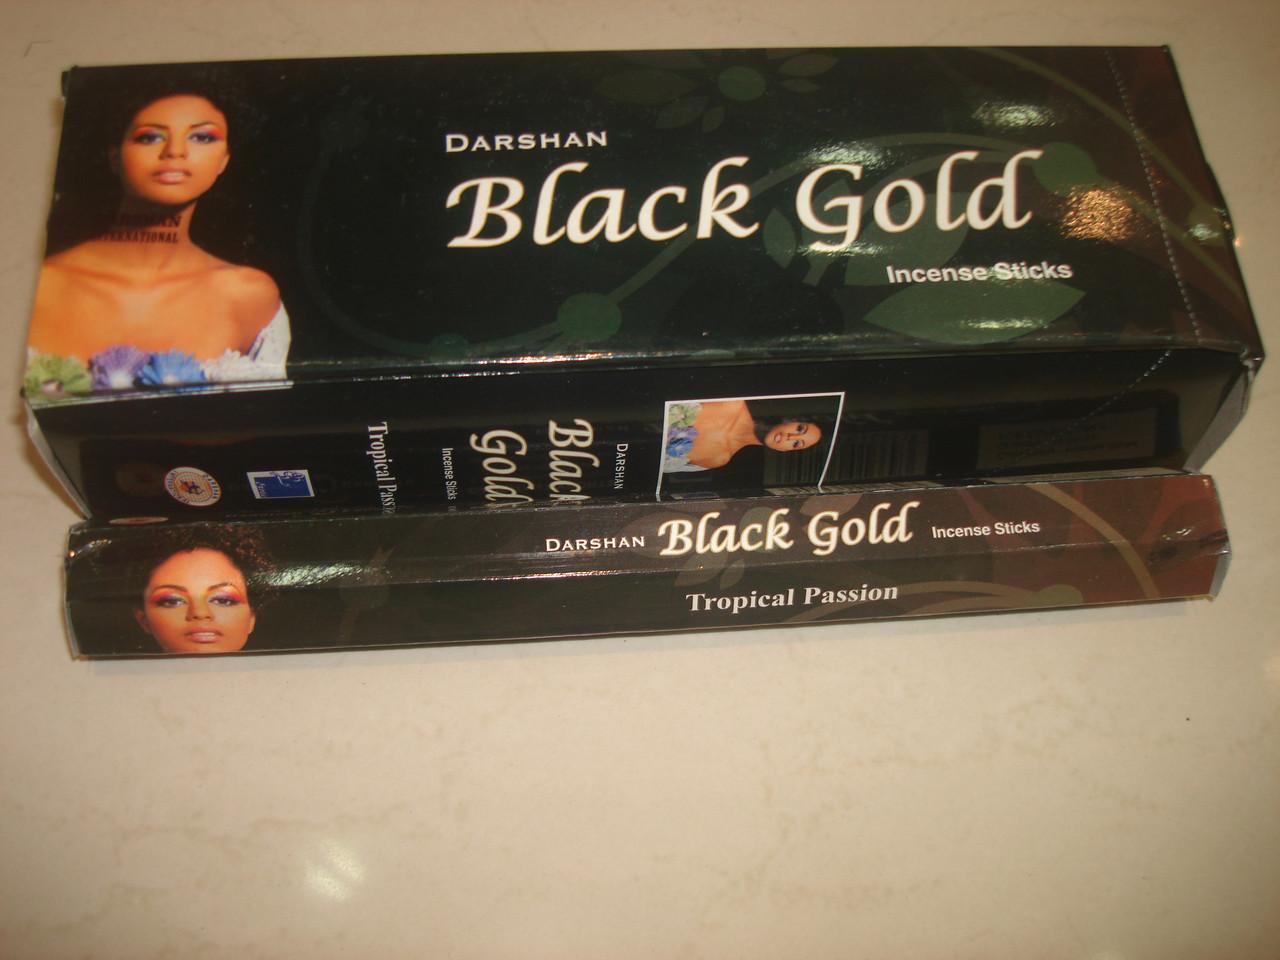 Black Gold Darshan